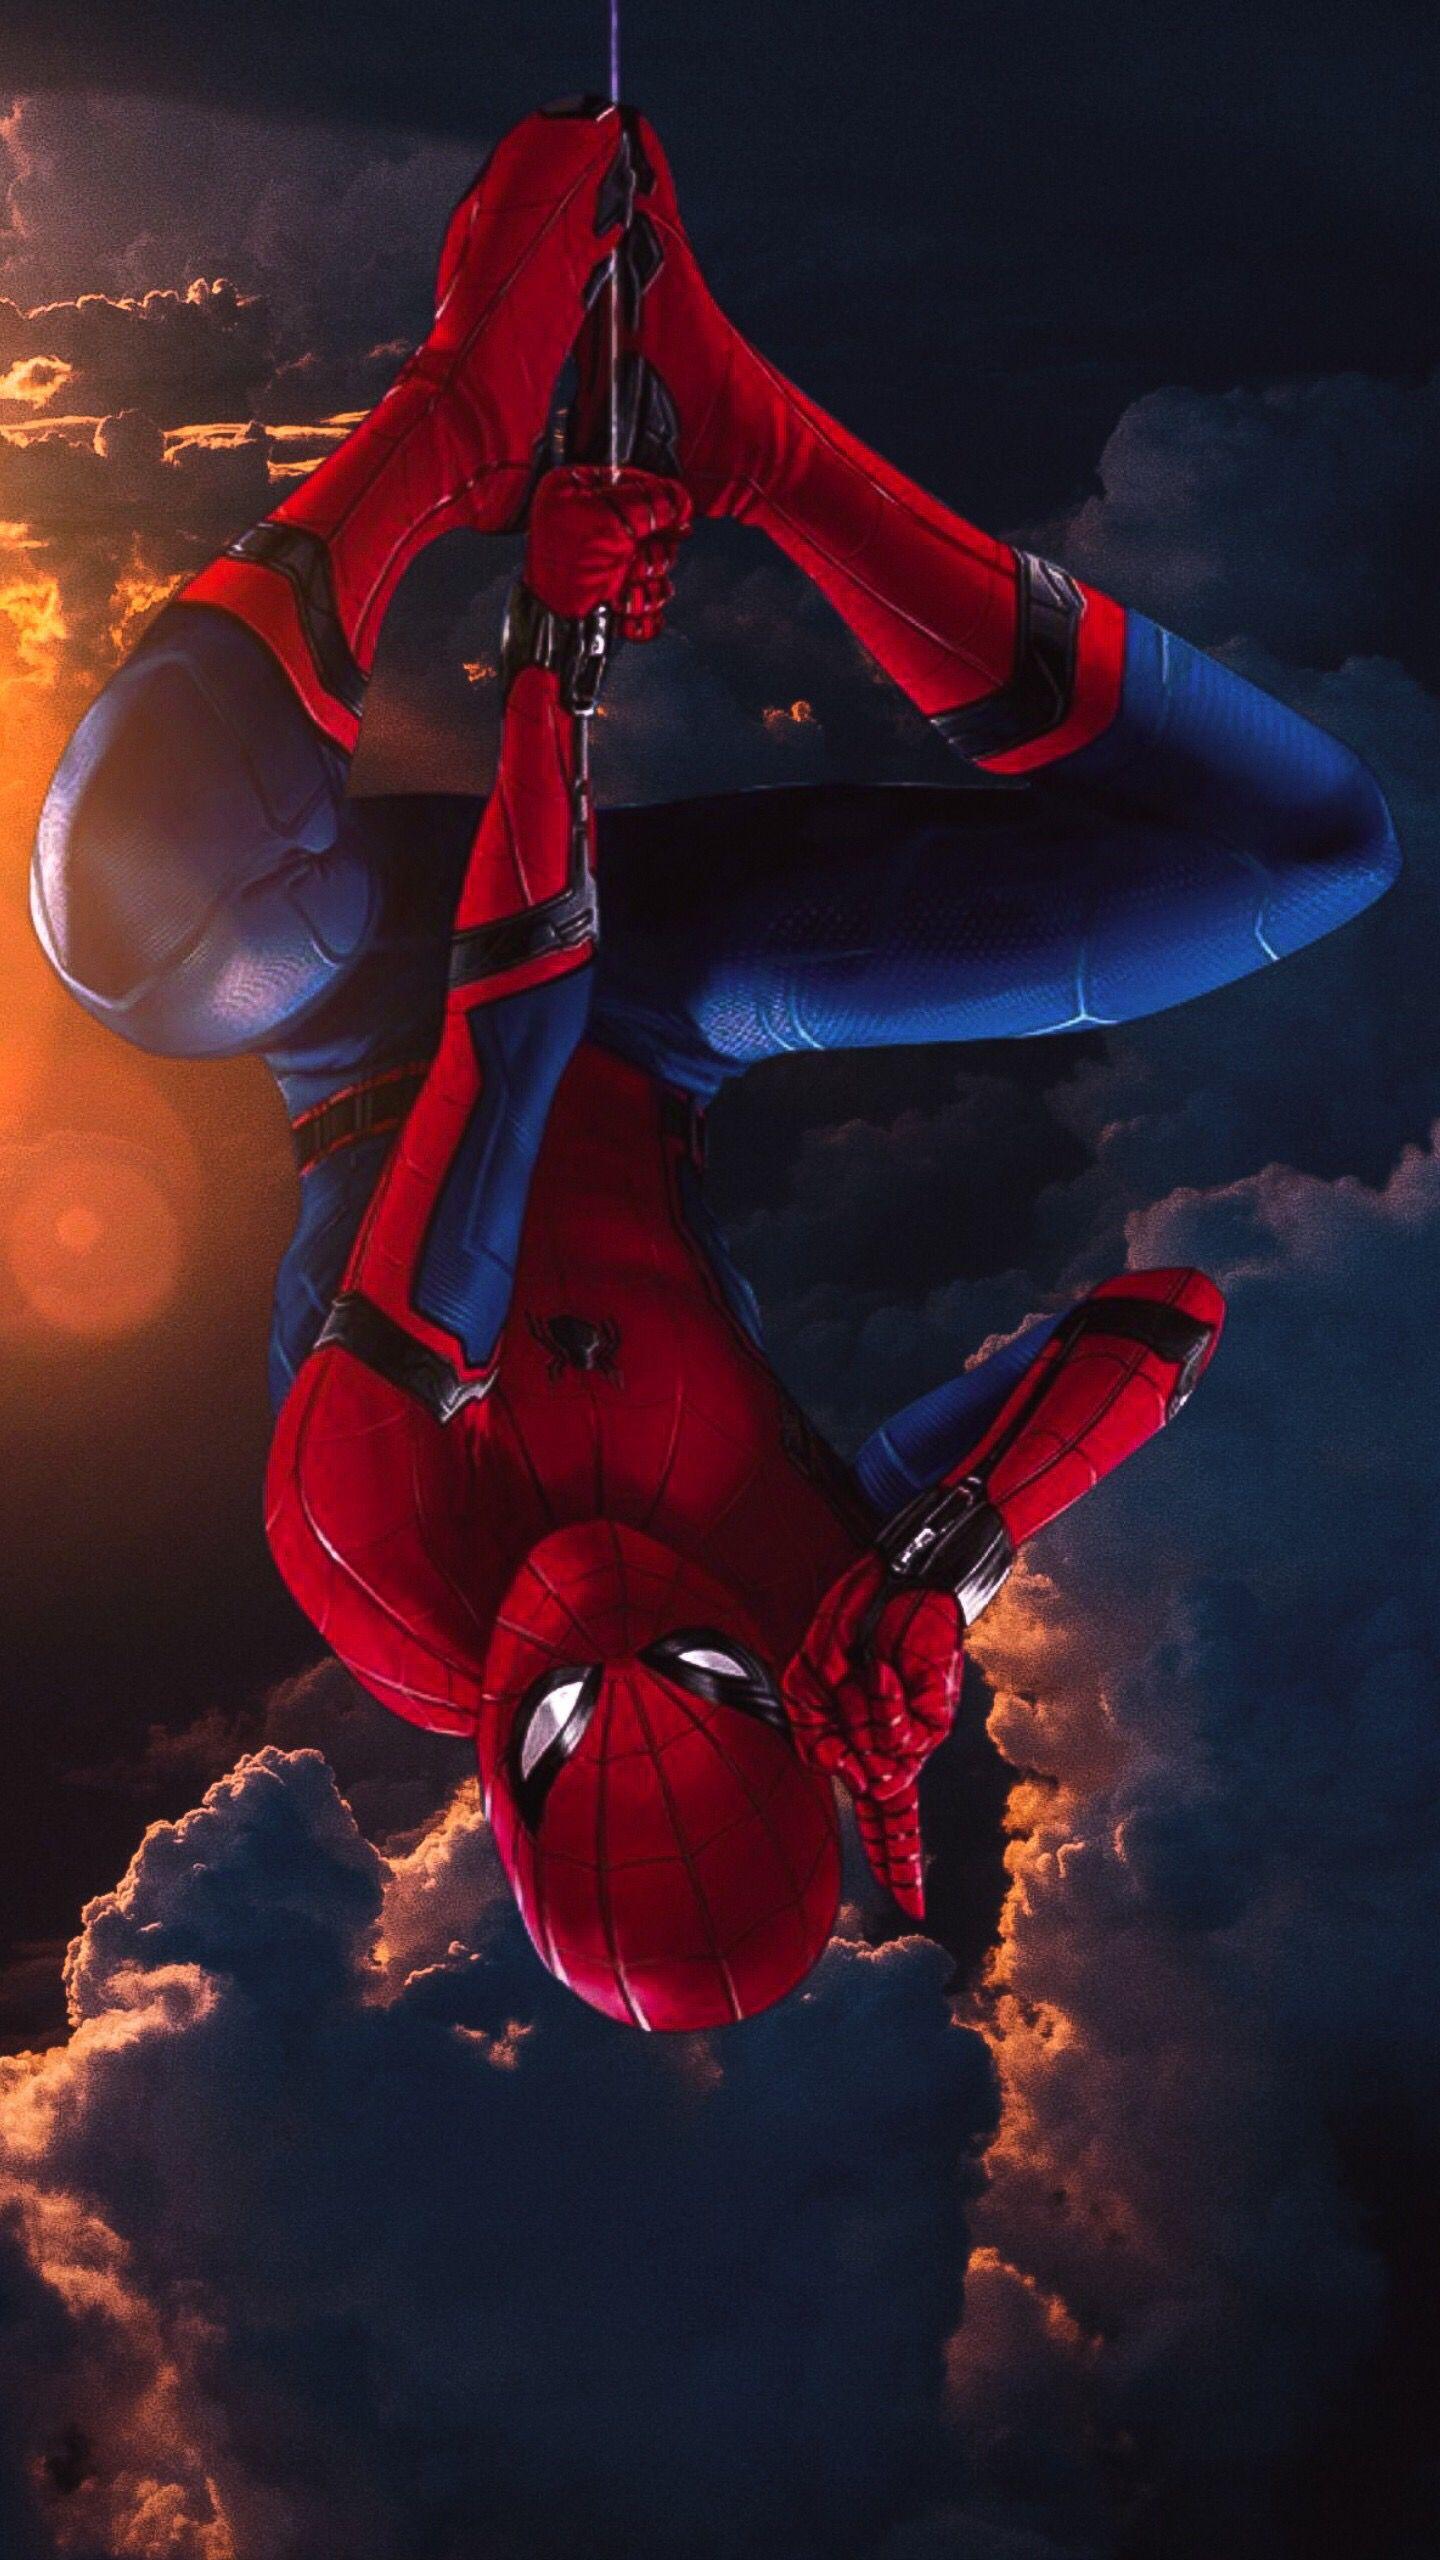 Pin By Santana Davenport On Spider Man Spiderman Avengers